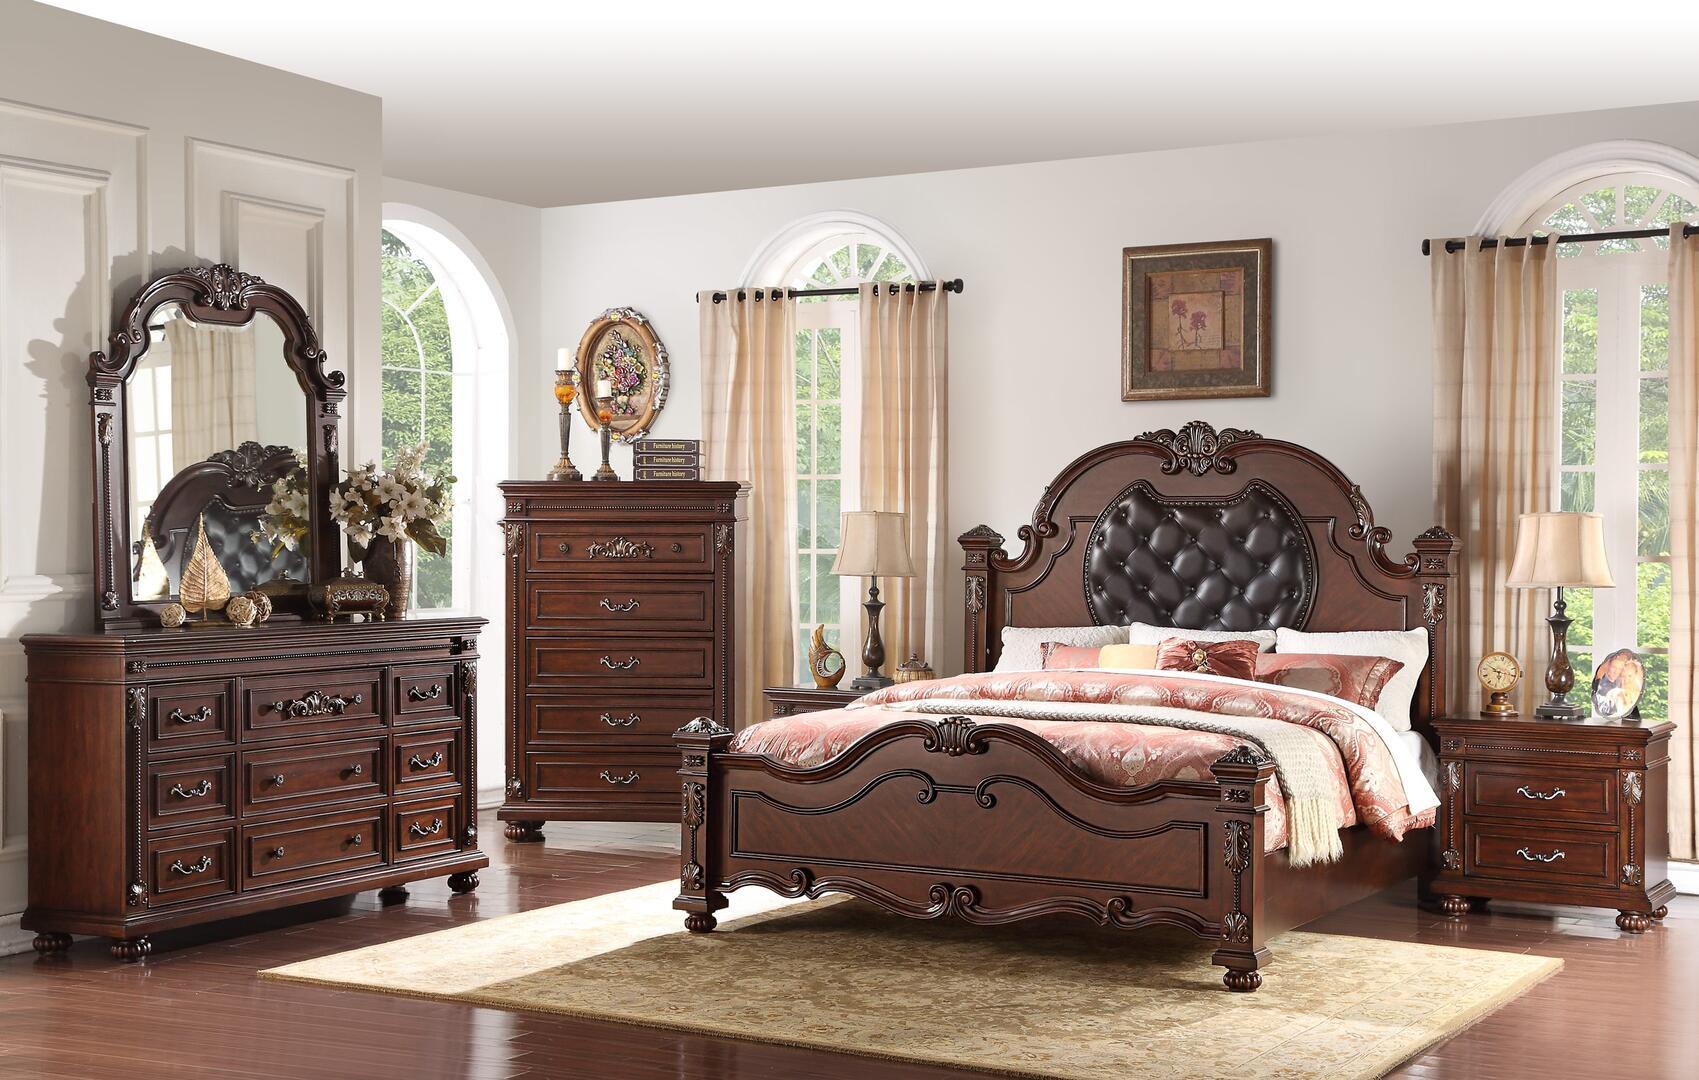 Cosmos Furniture Destiny 6 Piece King Size Bedroom Set